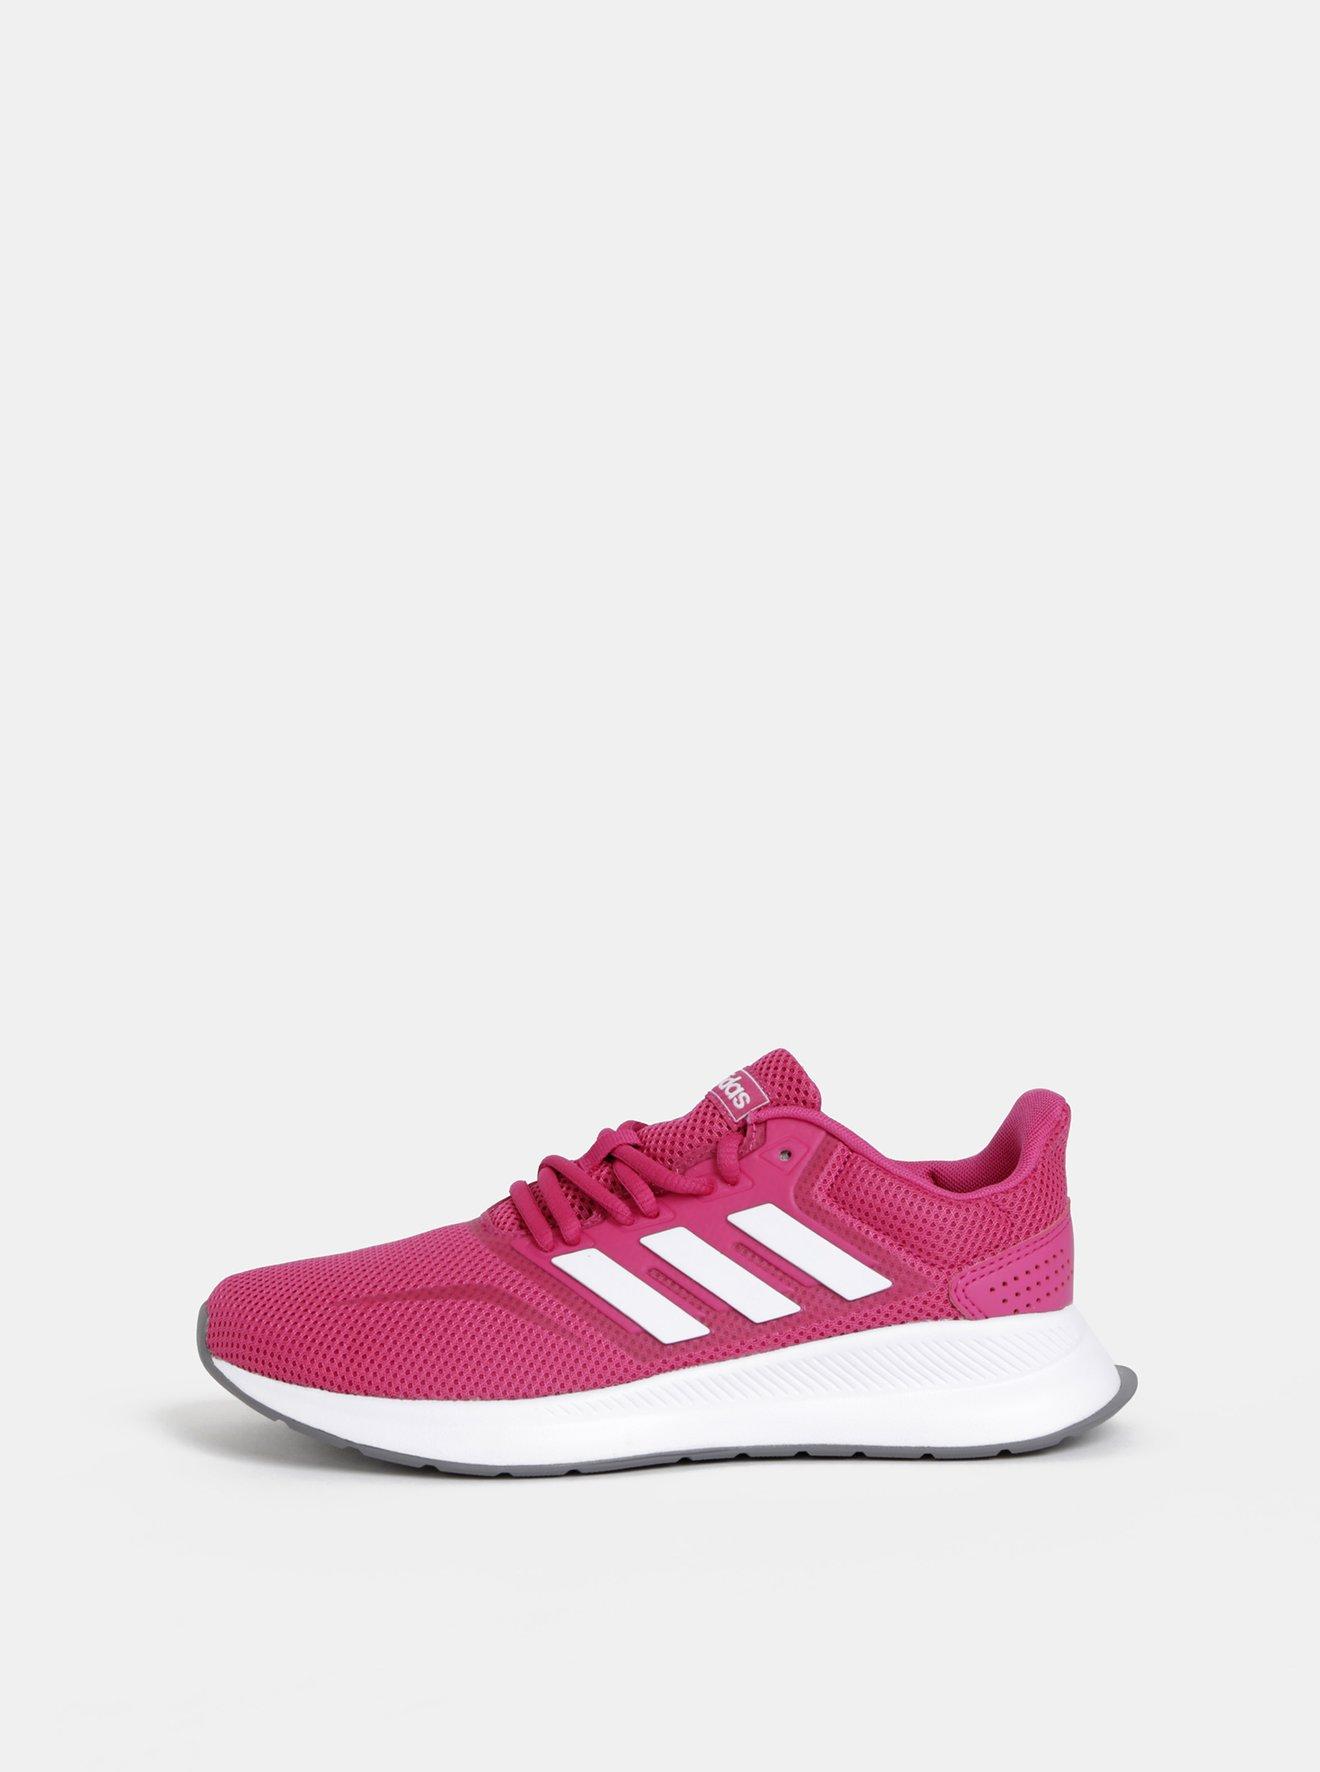 Tmavě růžové dámské tenisky adidas CORE Funfalcon